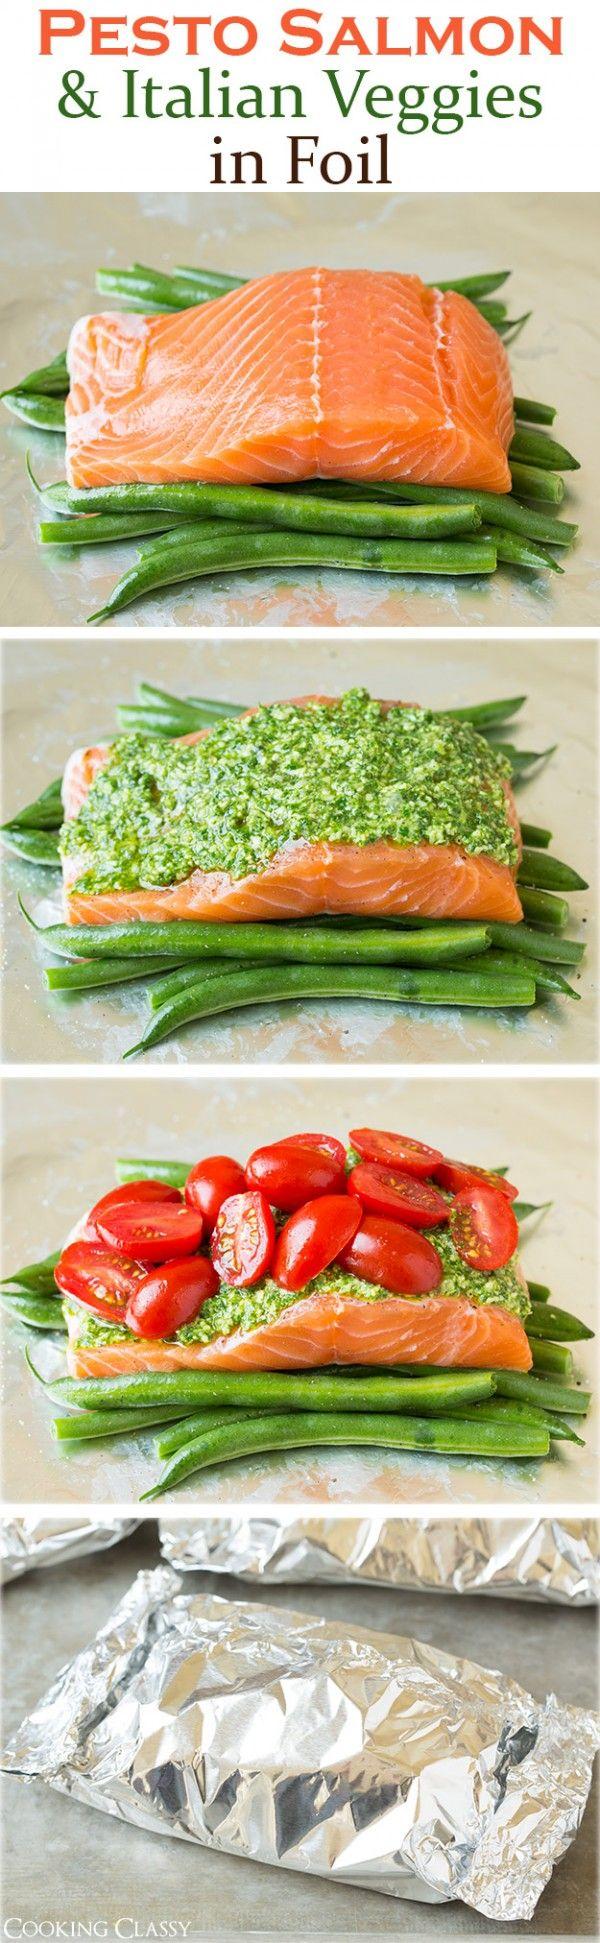 Get the recipe ♥ Pesto Salmon with Italian Veggies @recipes_to_go